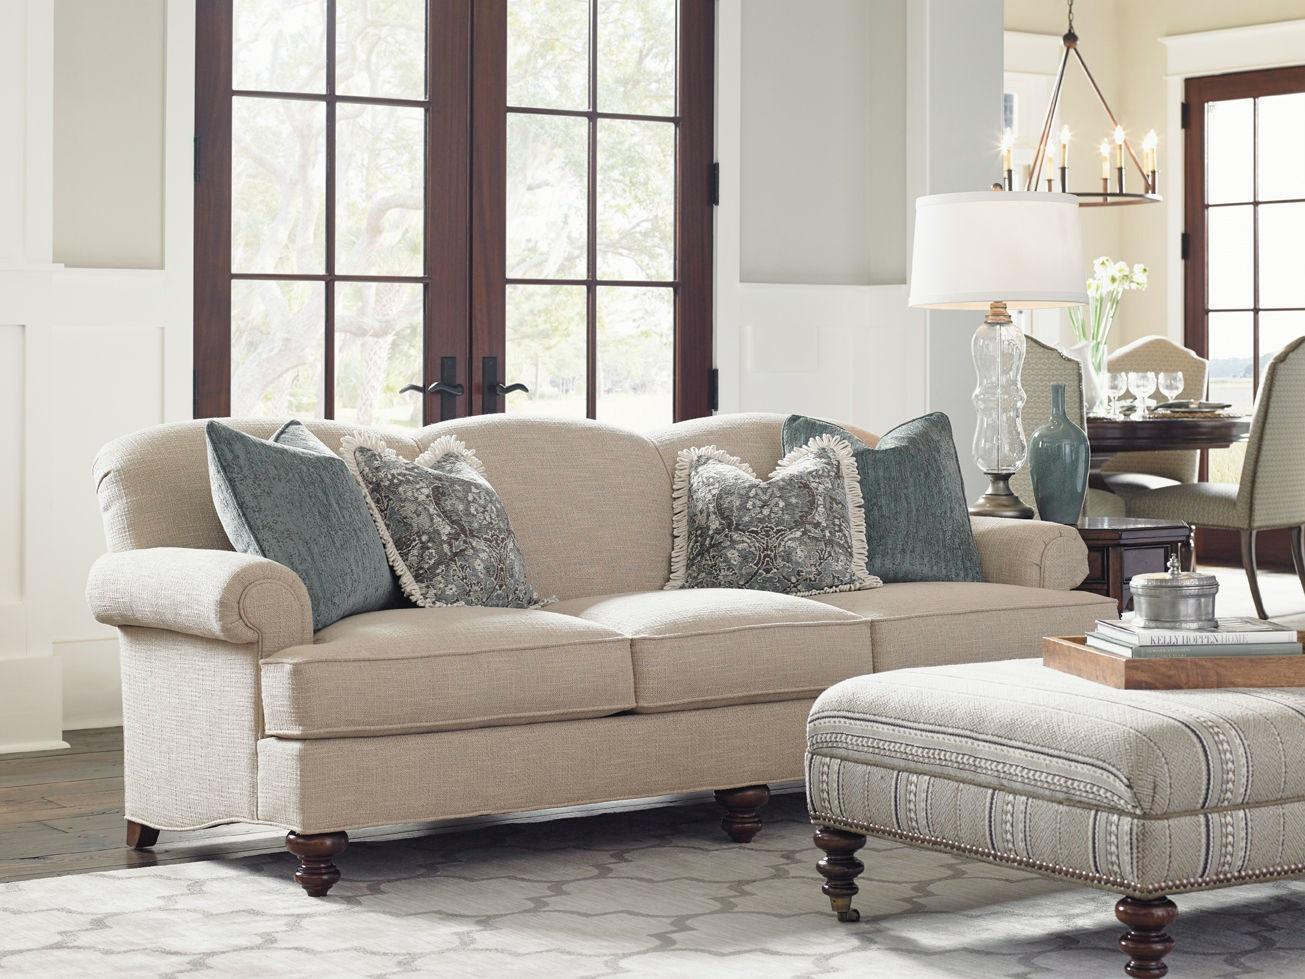 Lexington Asbury Sofa 7608 33